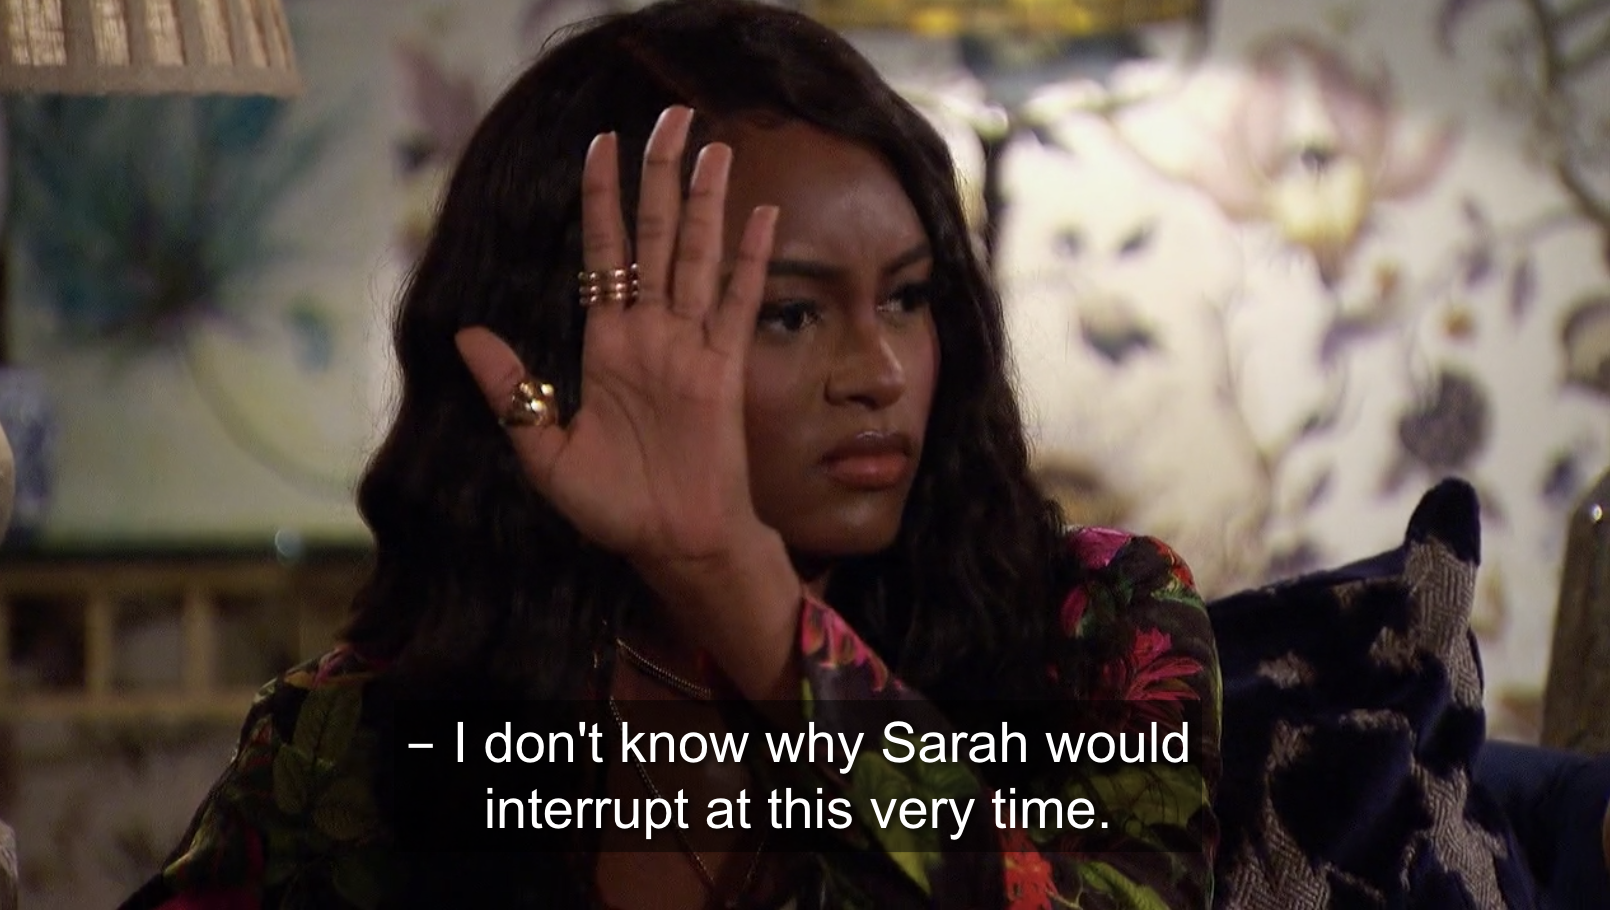 Khayla looking upset at Sarah's interruption